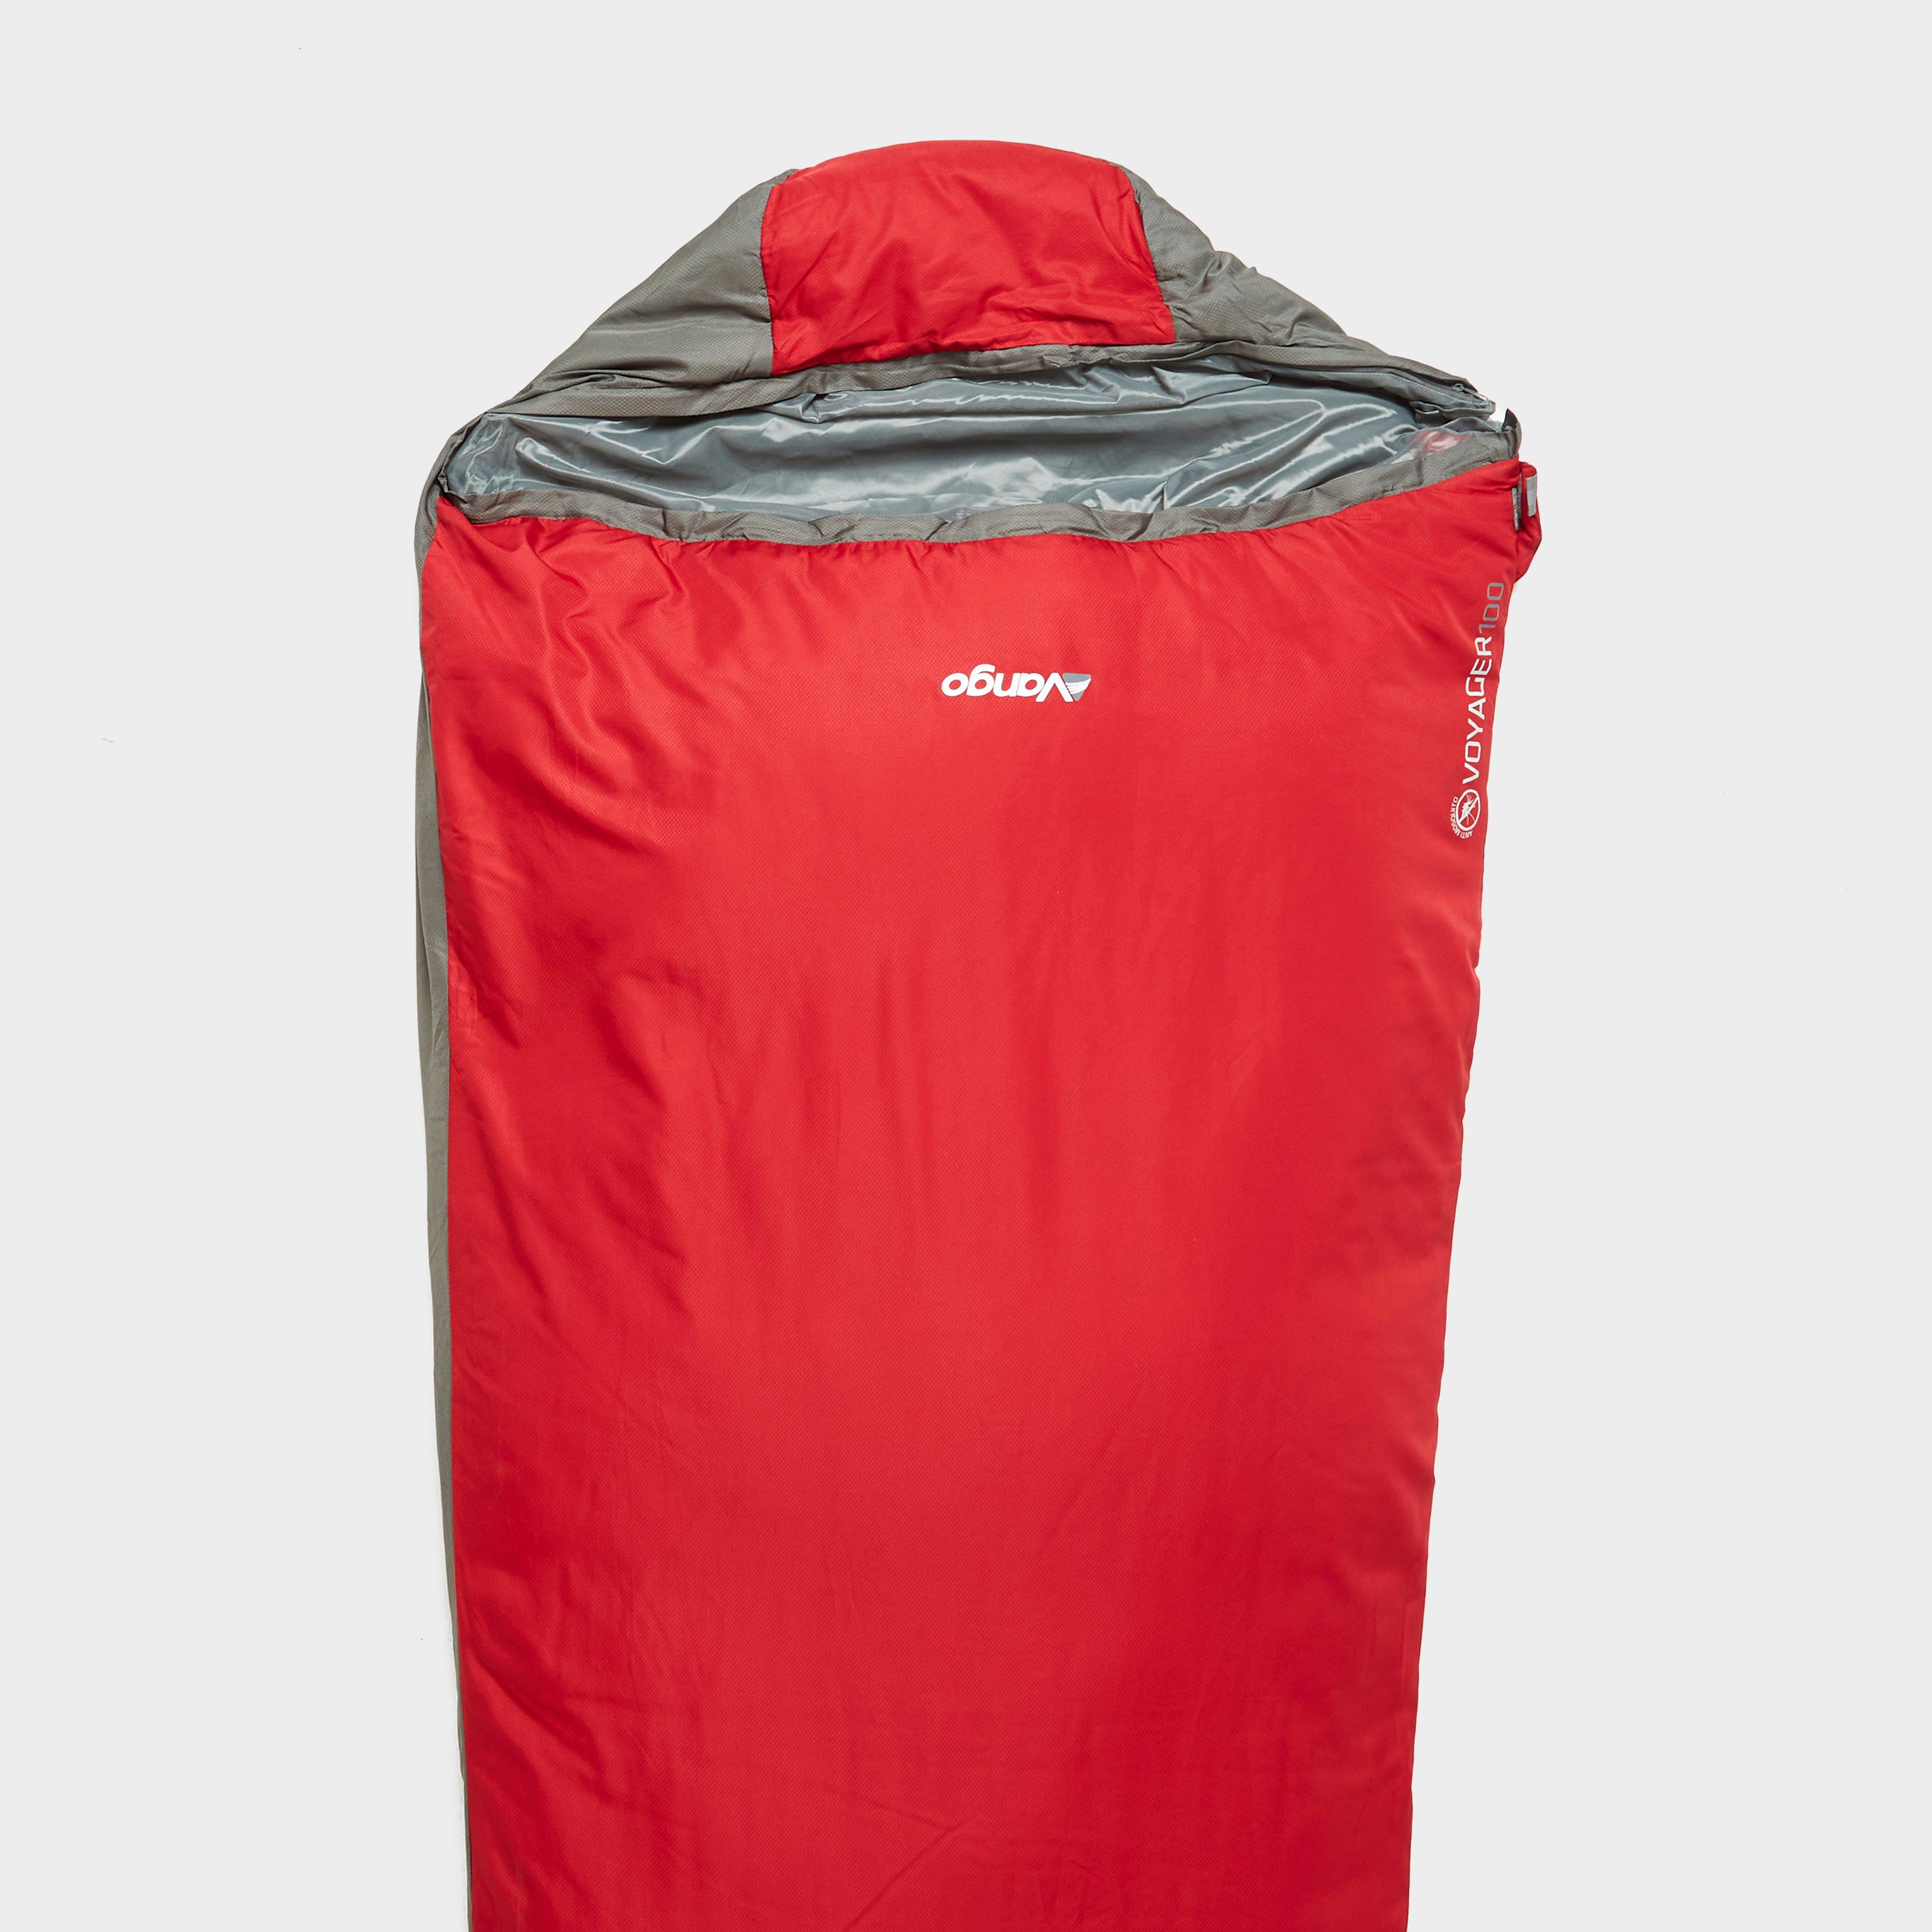 Vango Voyager 100 sleeping bag